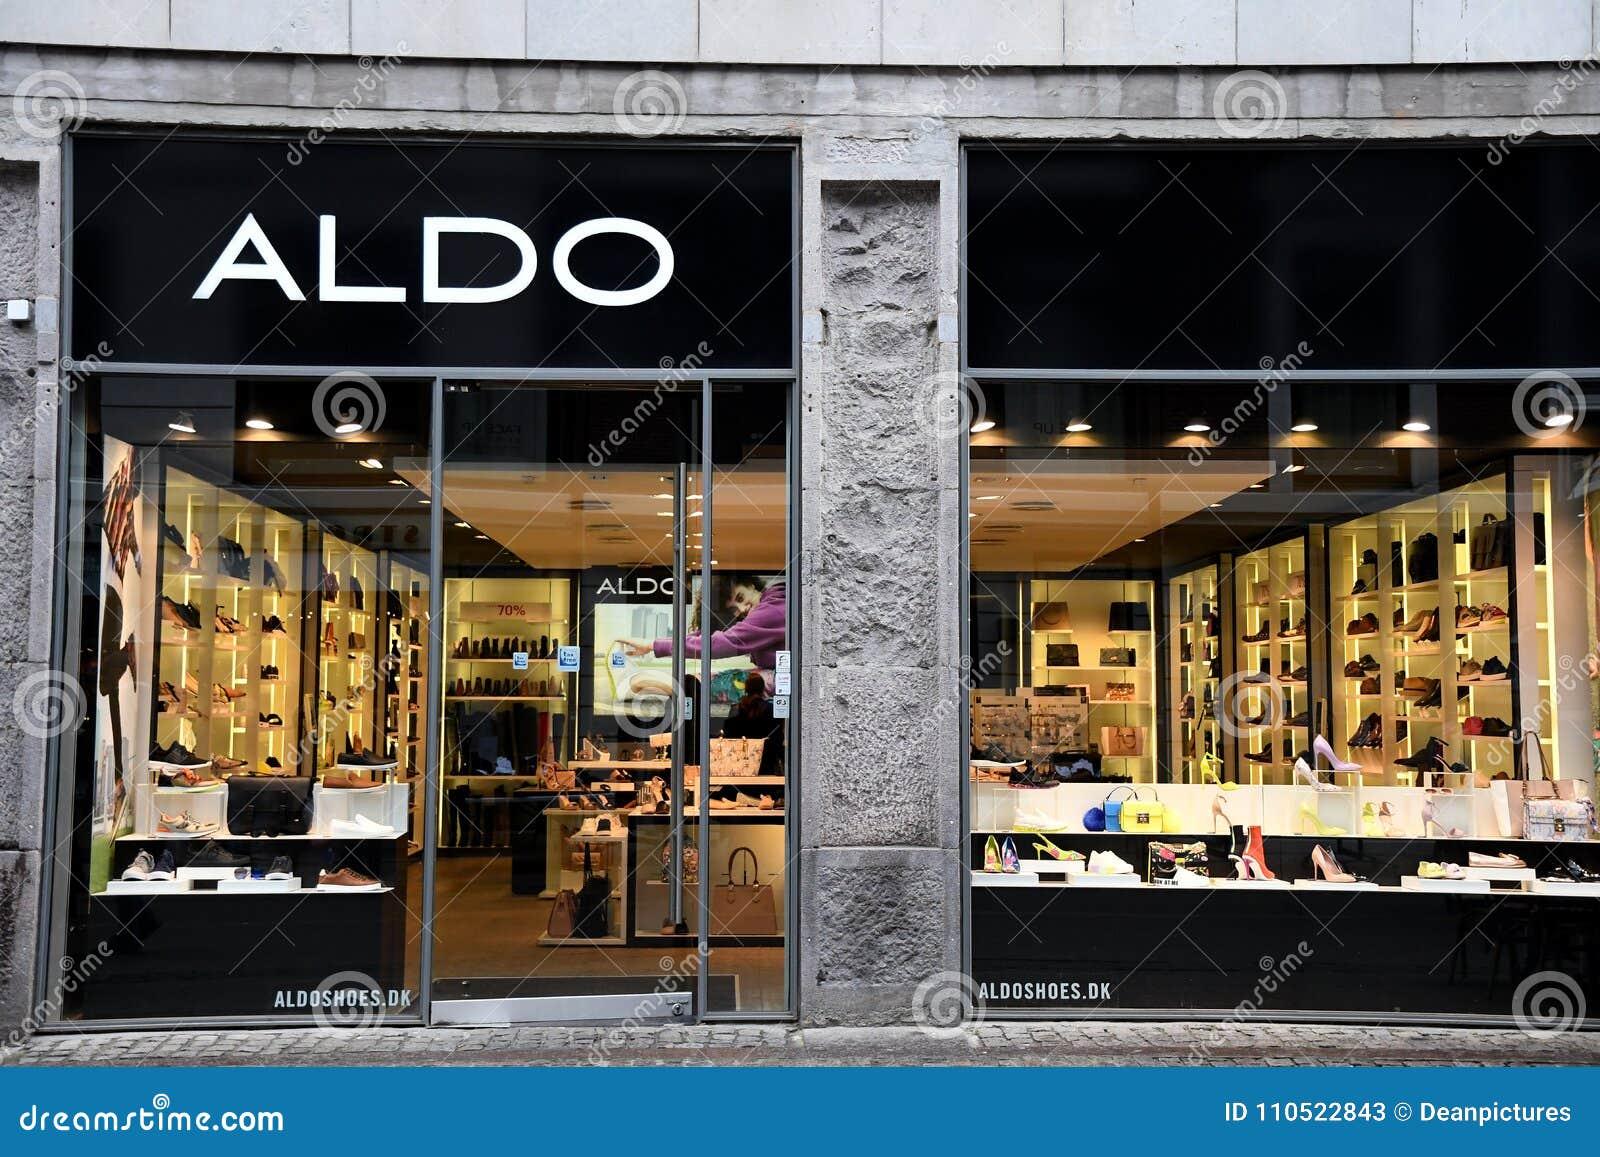 e4afc7462f4 Copenhagen /Denmark / 17. February.2018_ . Aldo shoe shop . Photo.Francis  Joseph Dean / Deanpictures.